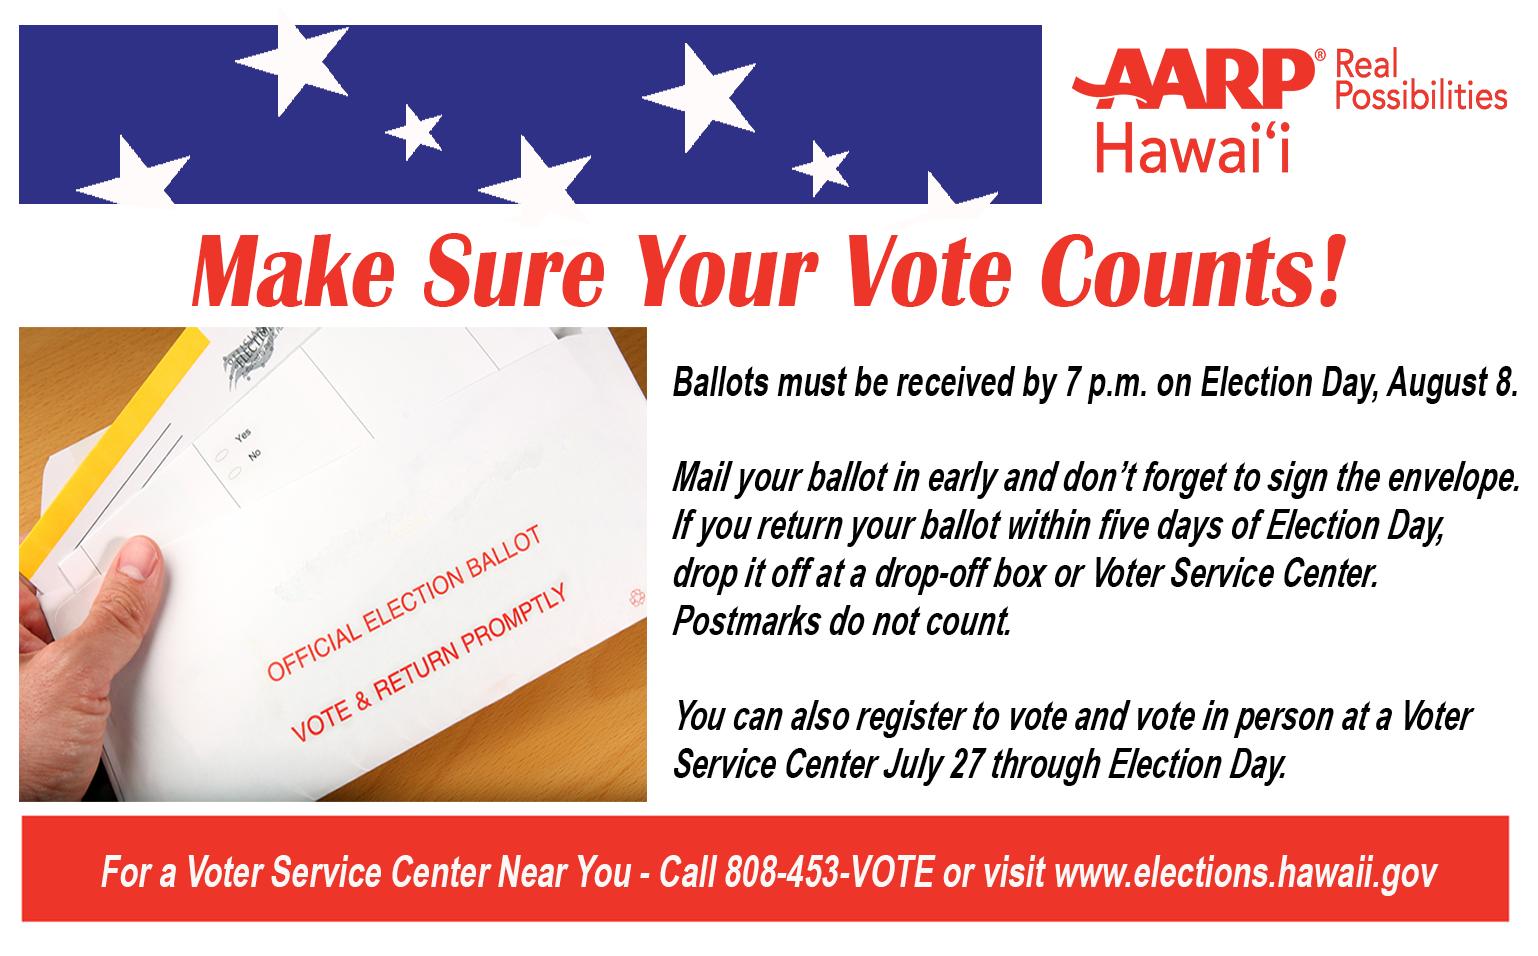 Make Sure Your Vote Counts 2020